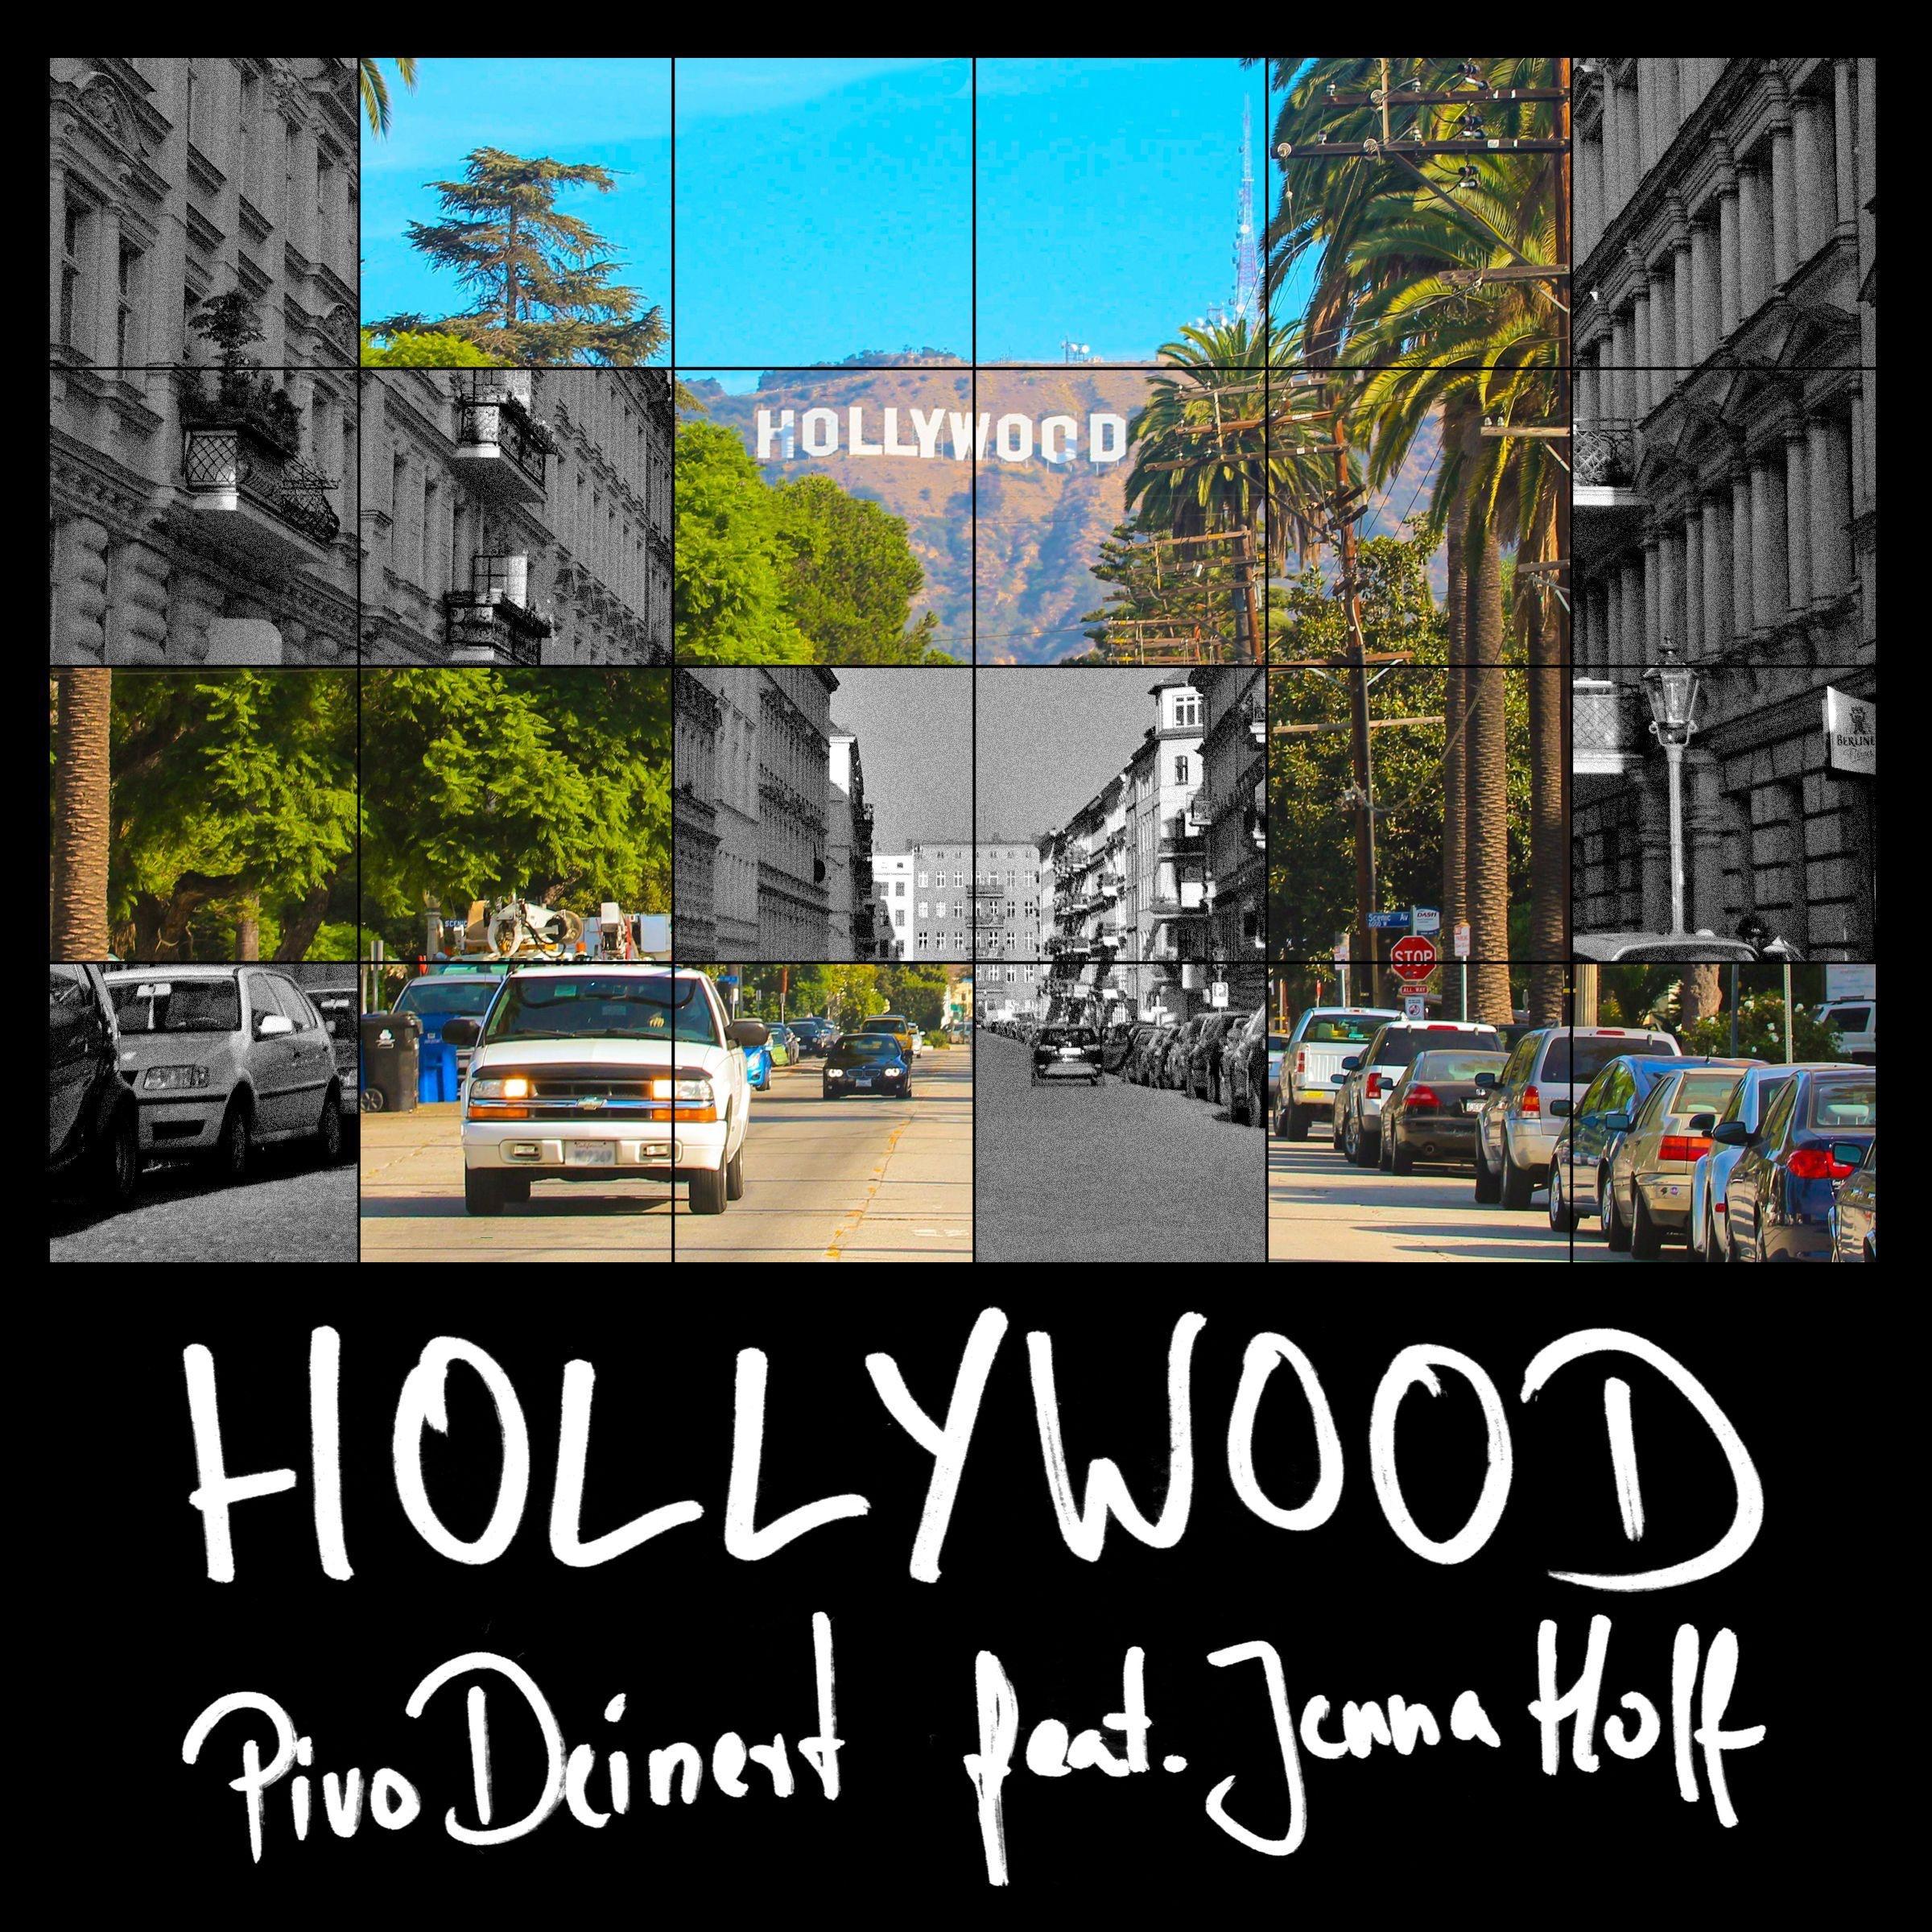 Hollywood (feat. Jenna Hoff) - Single